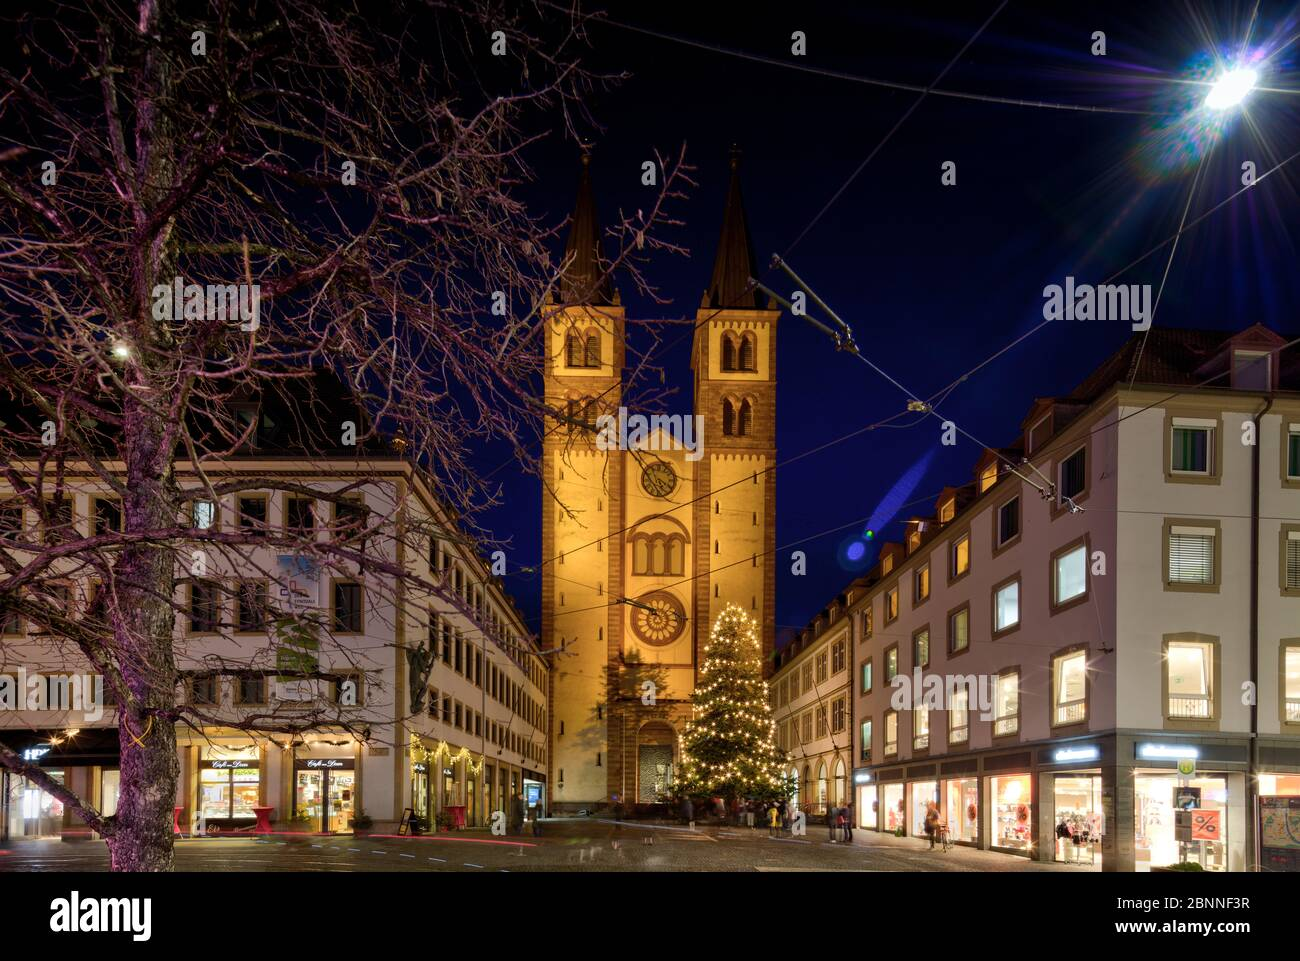 Domstrasse, St. Kilian cathedral, blue hour, old town, Christmas market, Wuerzburg, Franconia, Bavaria, Germany, Stock Photo